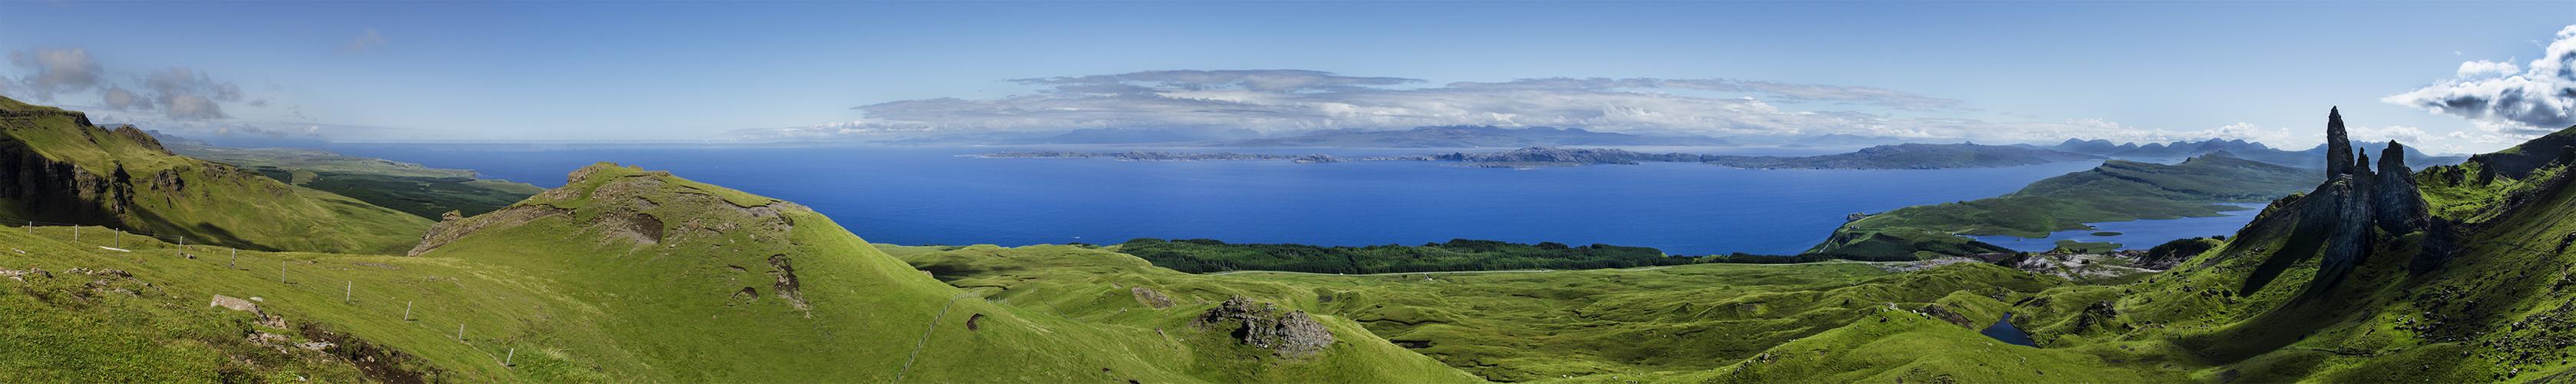 Panorama: Old Man of Storr, Isle of Skye